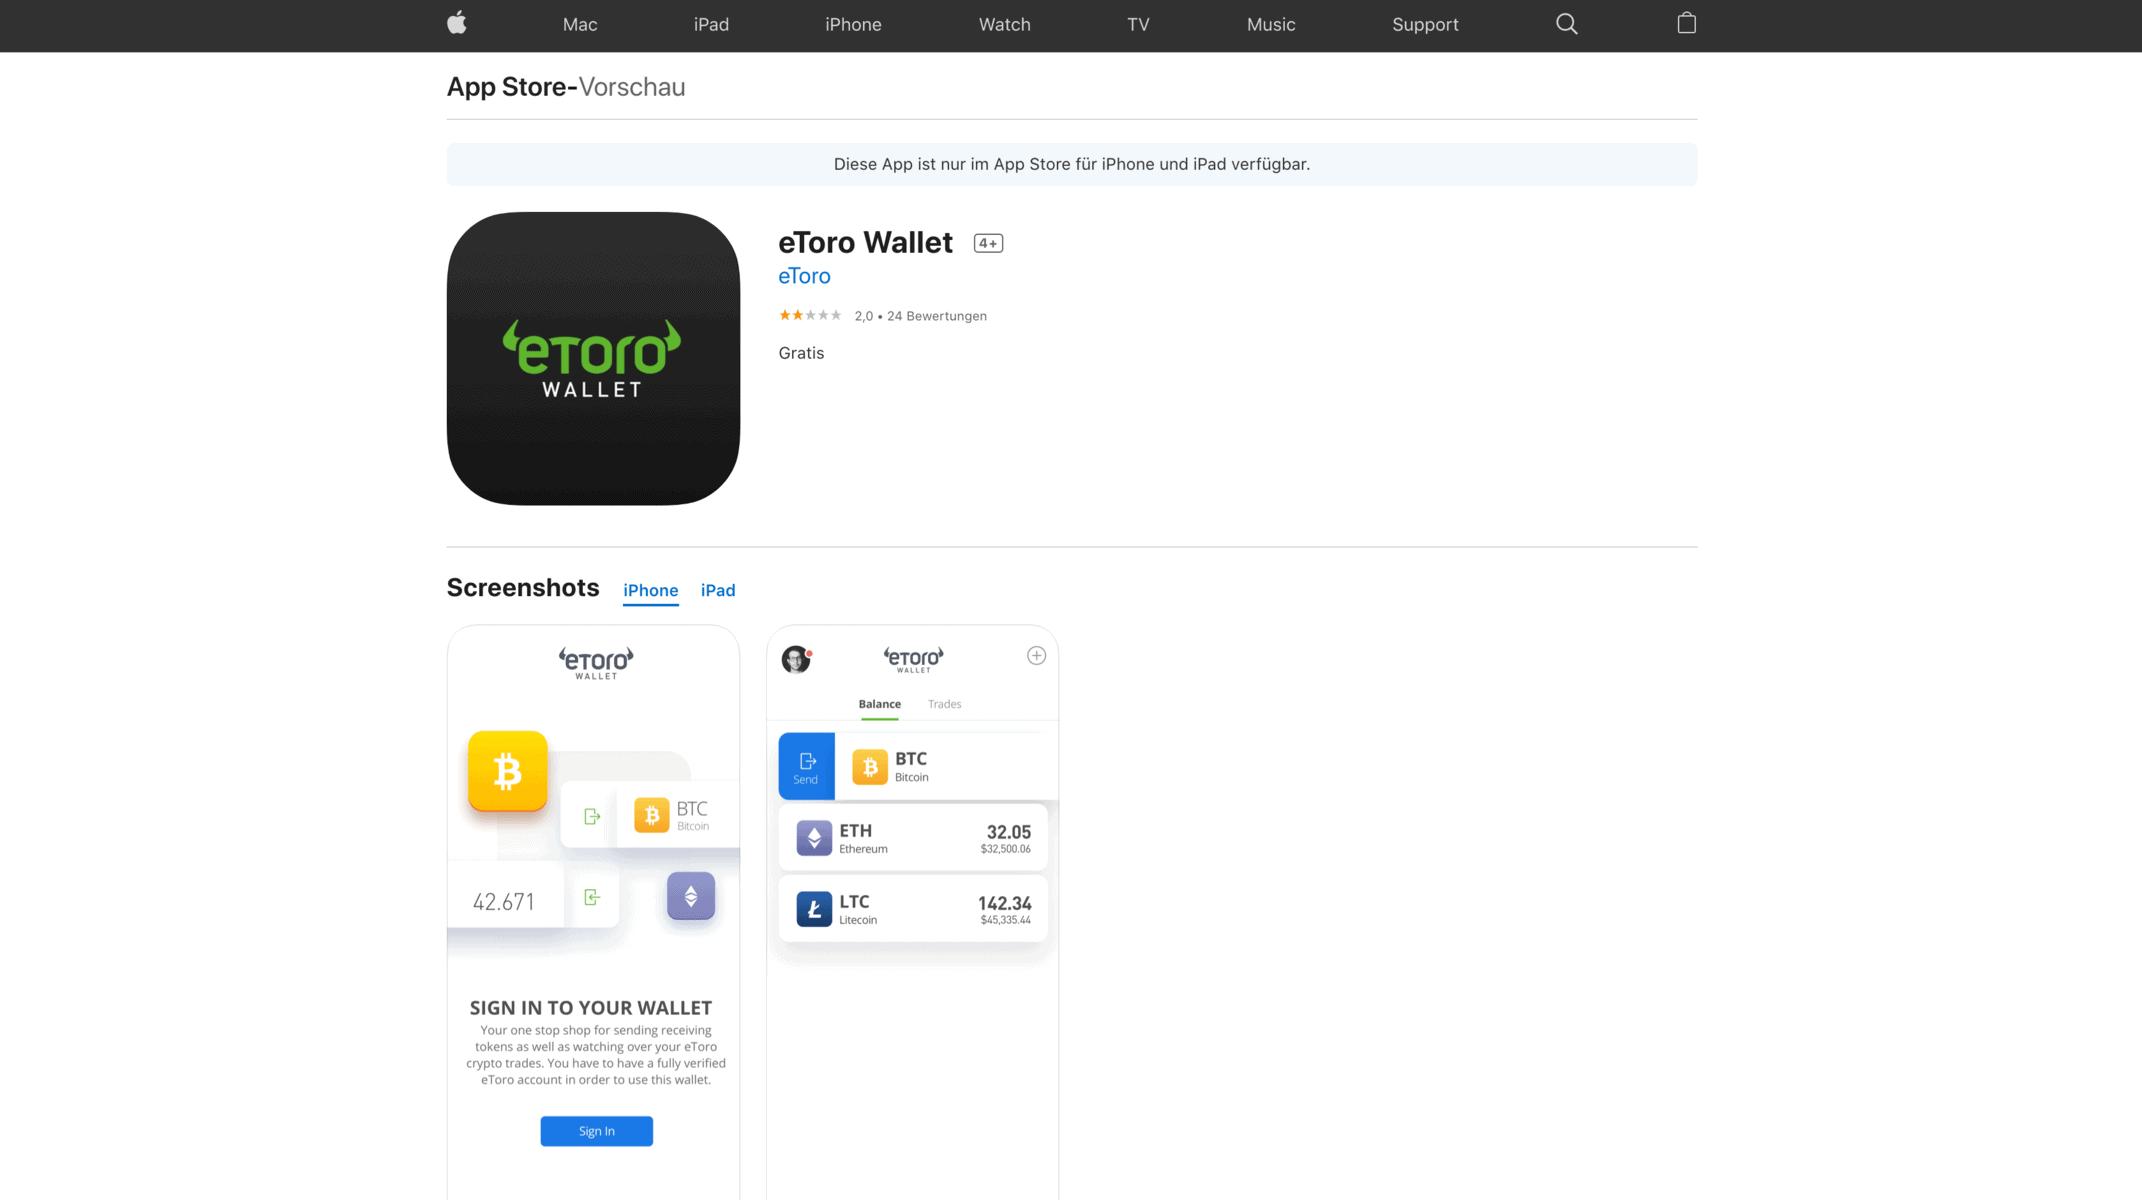 etoro-wallet-app-store